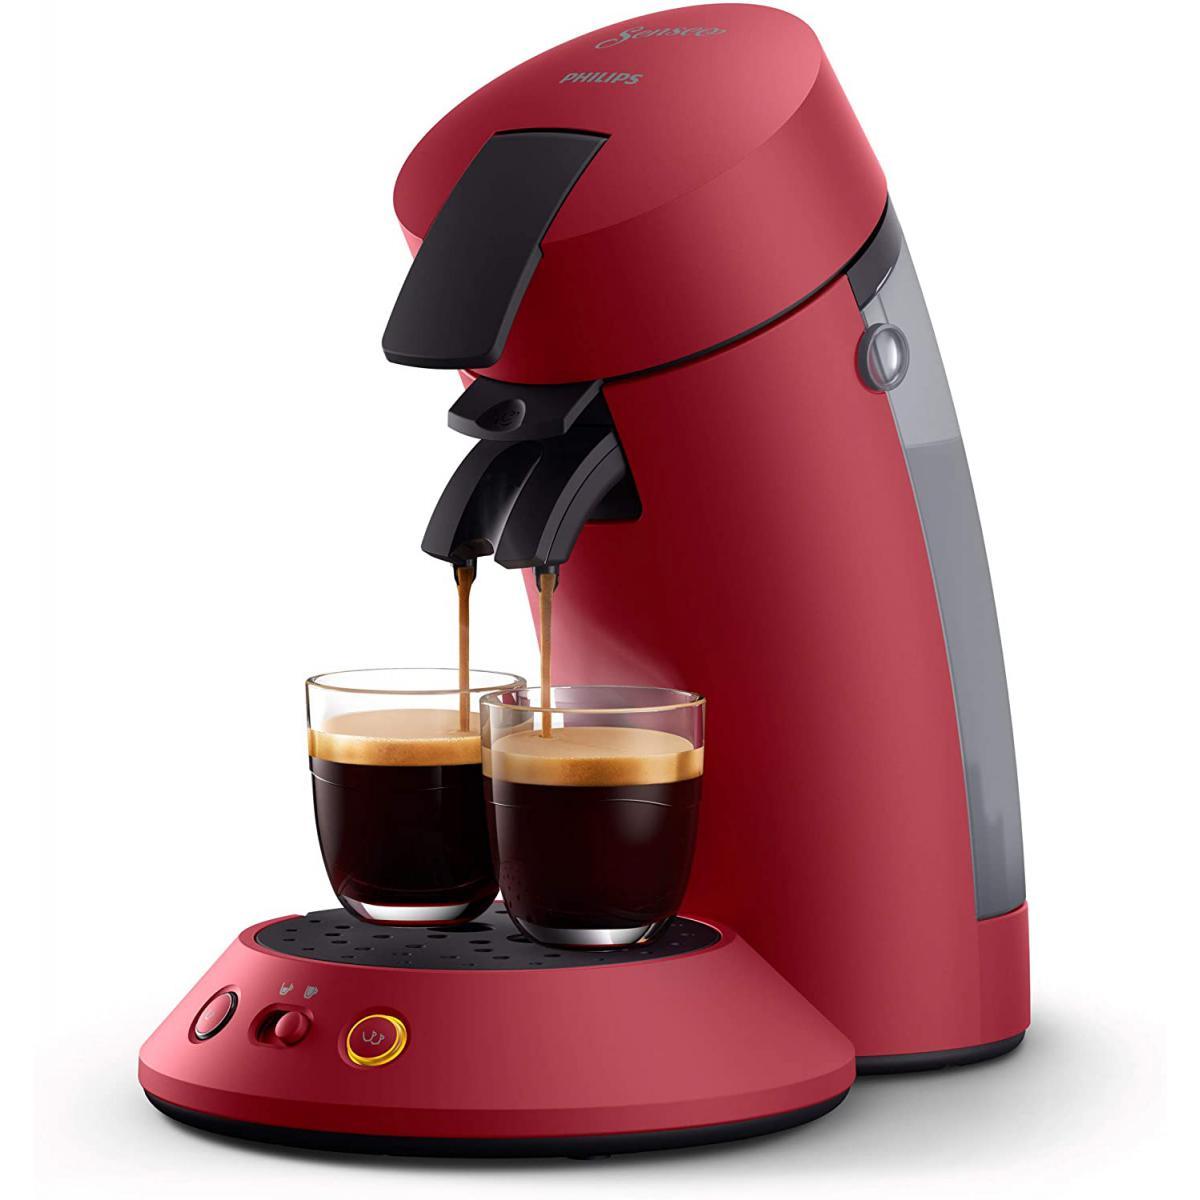 Philips machine à café dosettes SENSEO Original+ rouge